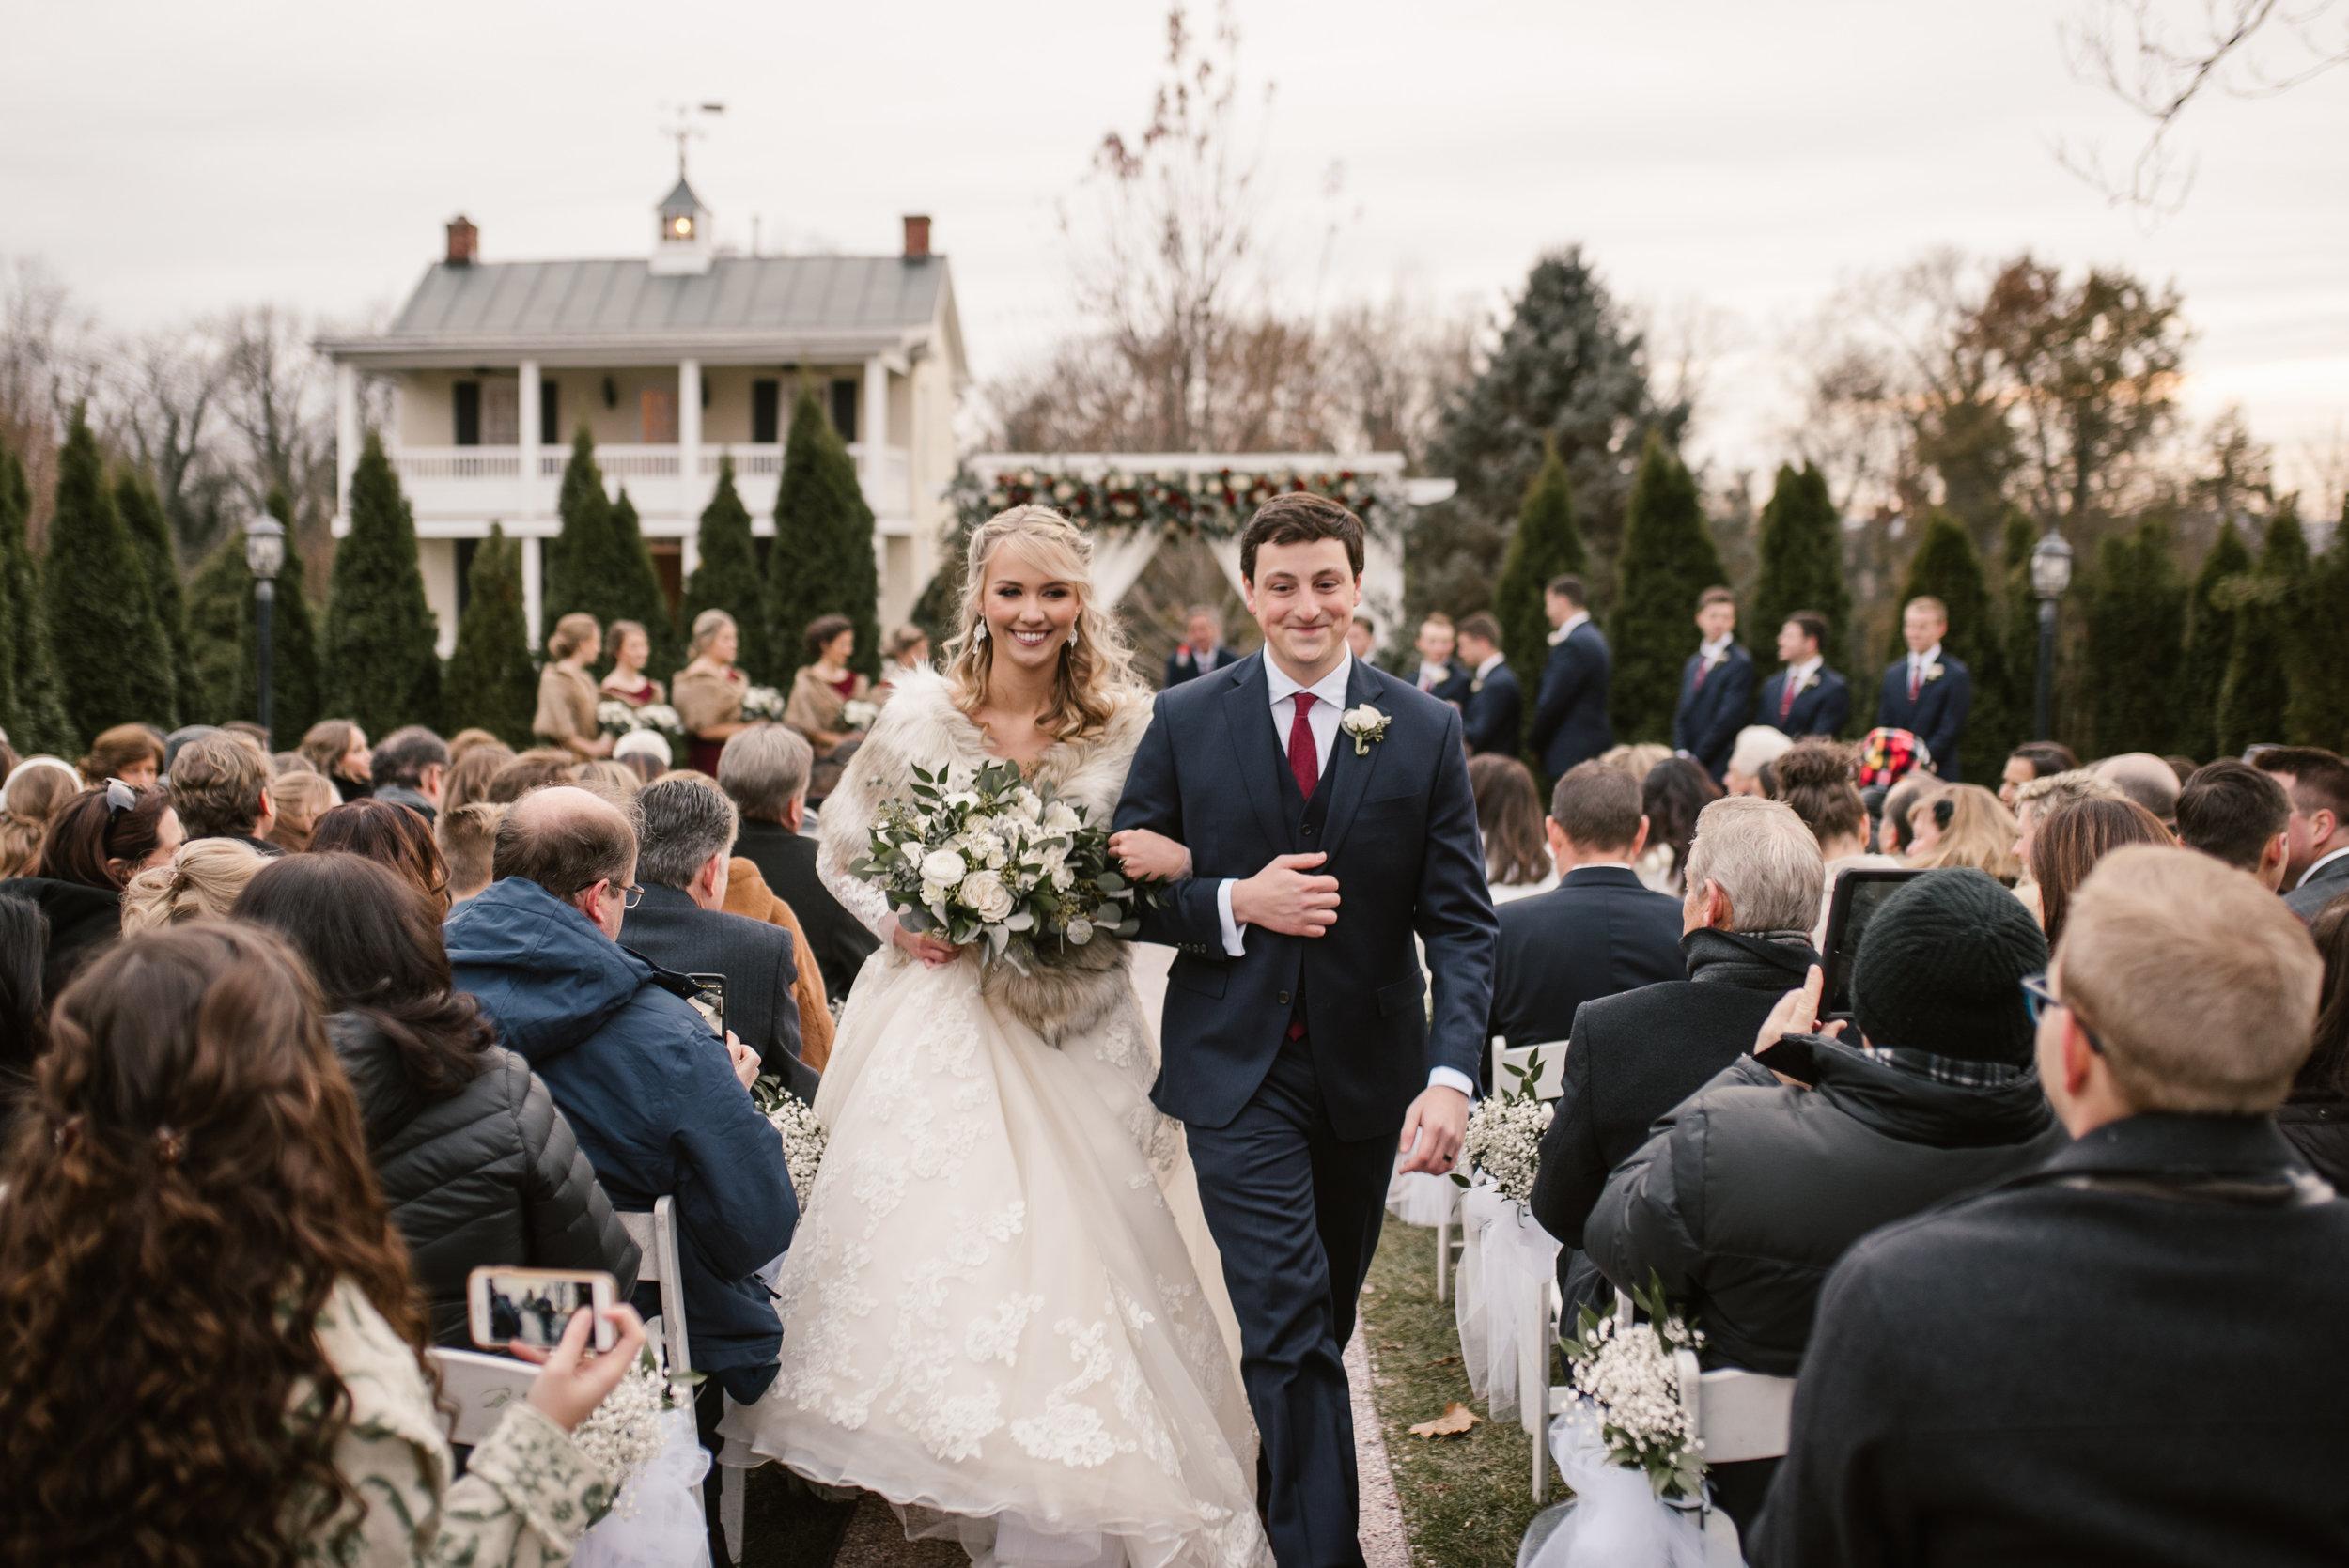 antrim-18444-spencer-wedding-1300.jpg